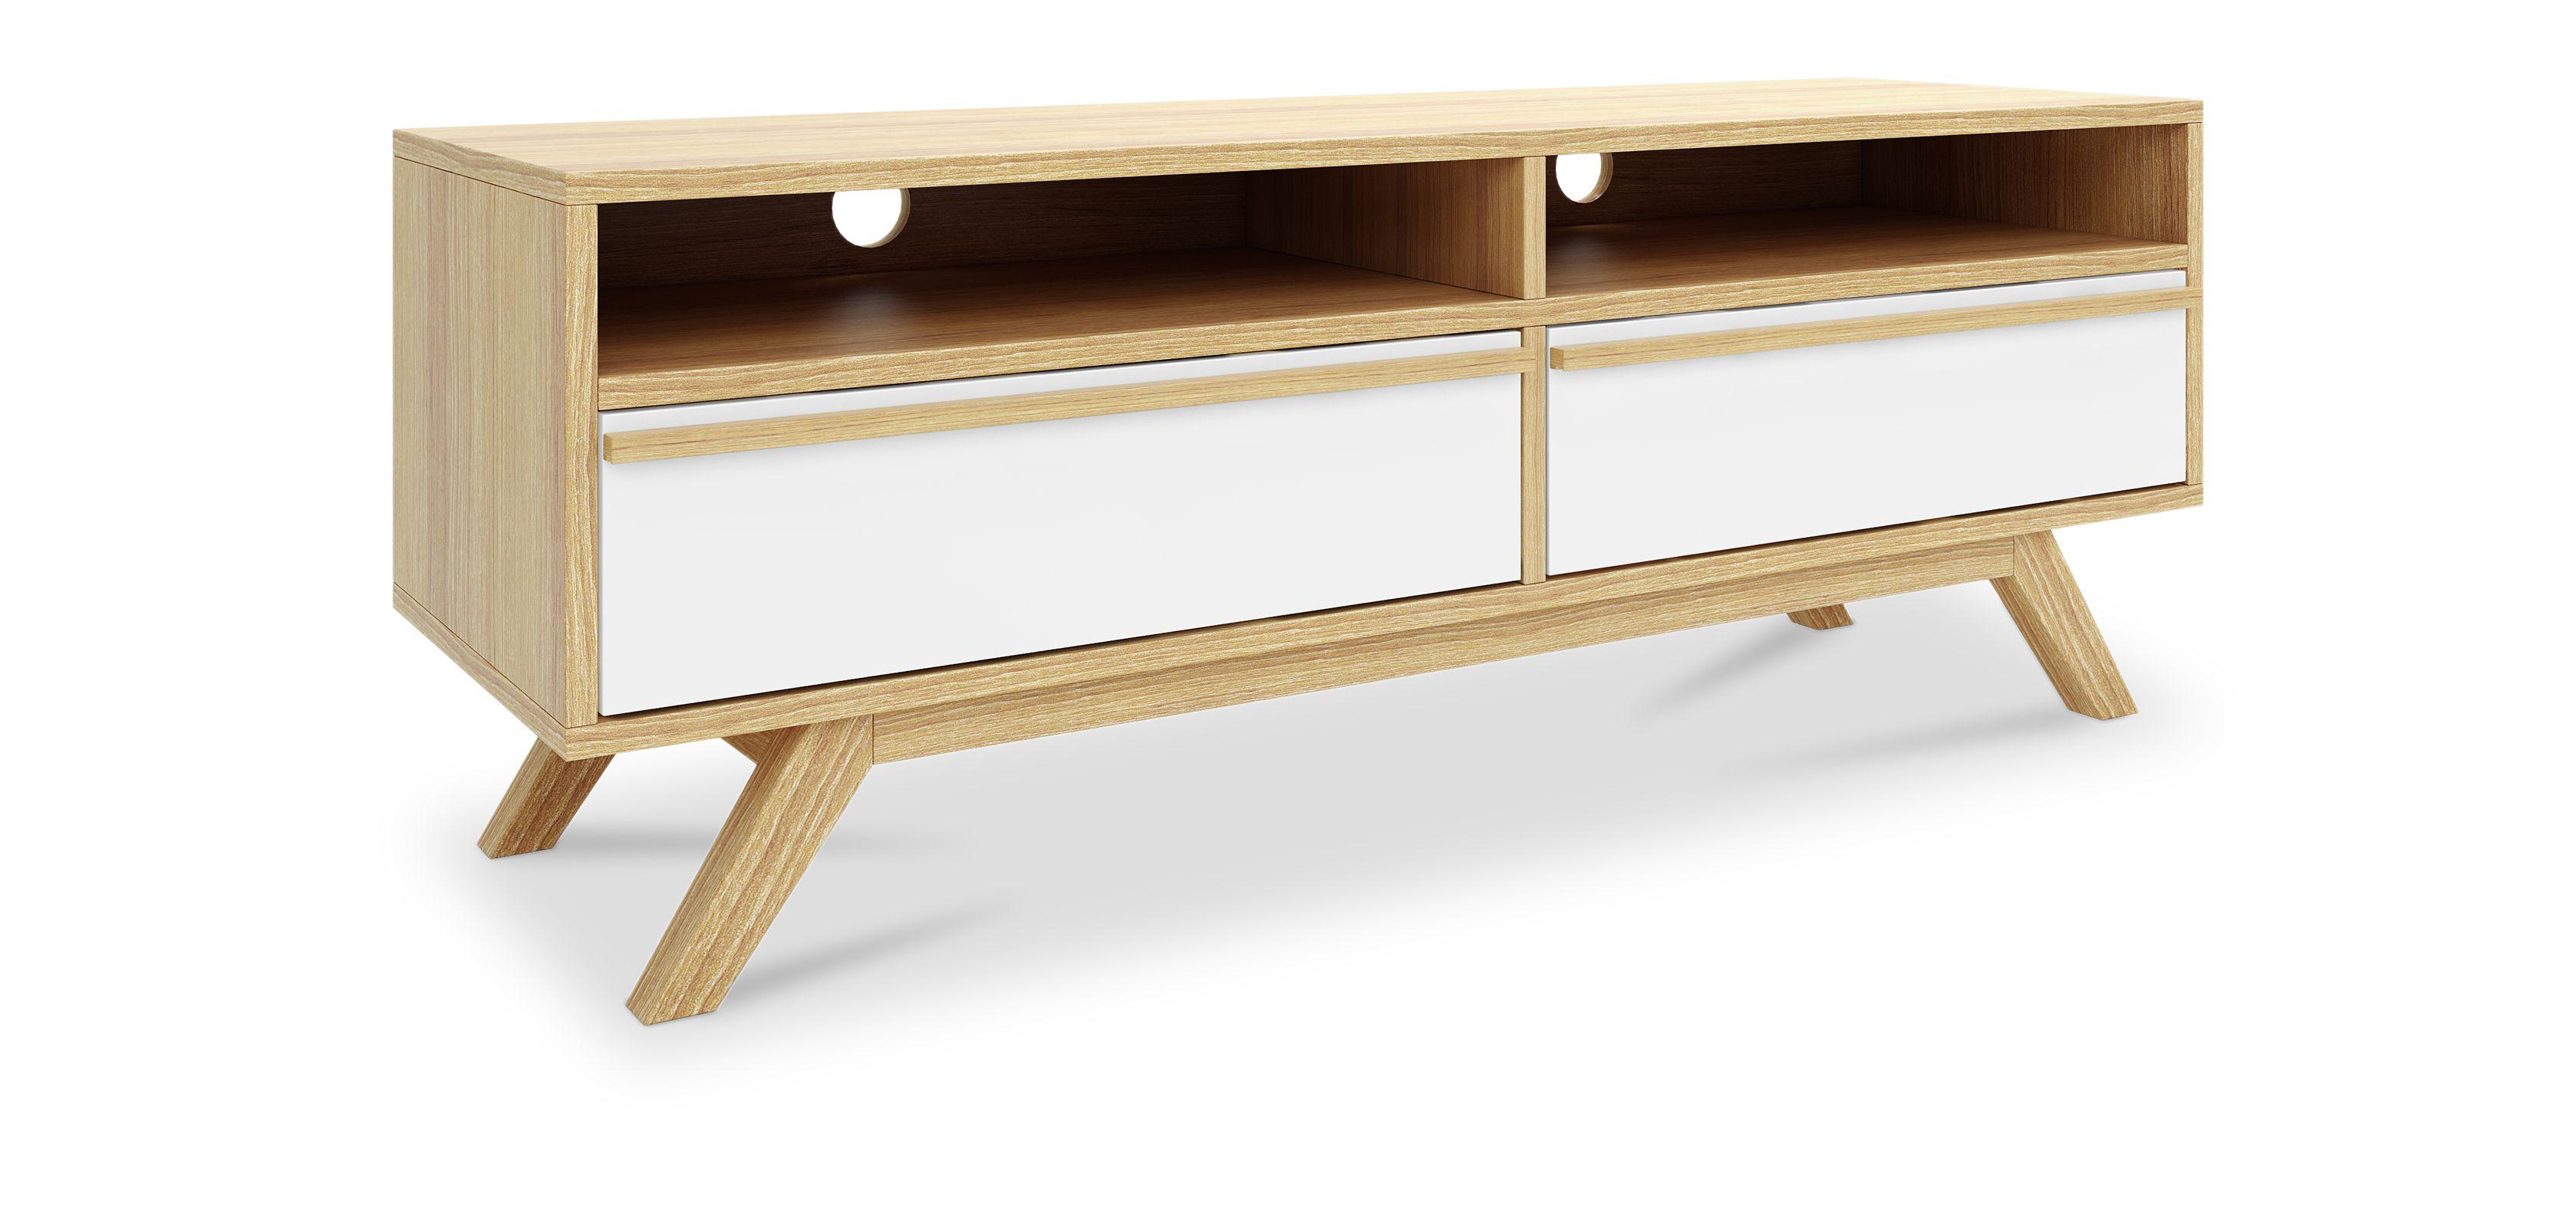 meuble tv style nordique best n bois acheter pinterest scandinavian style drawers and. Black Bedroom Furniture Sets. Home Design Ideas